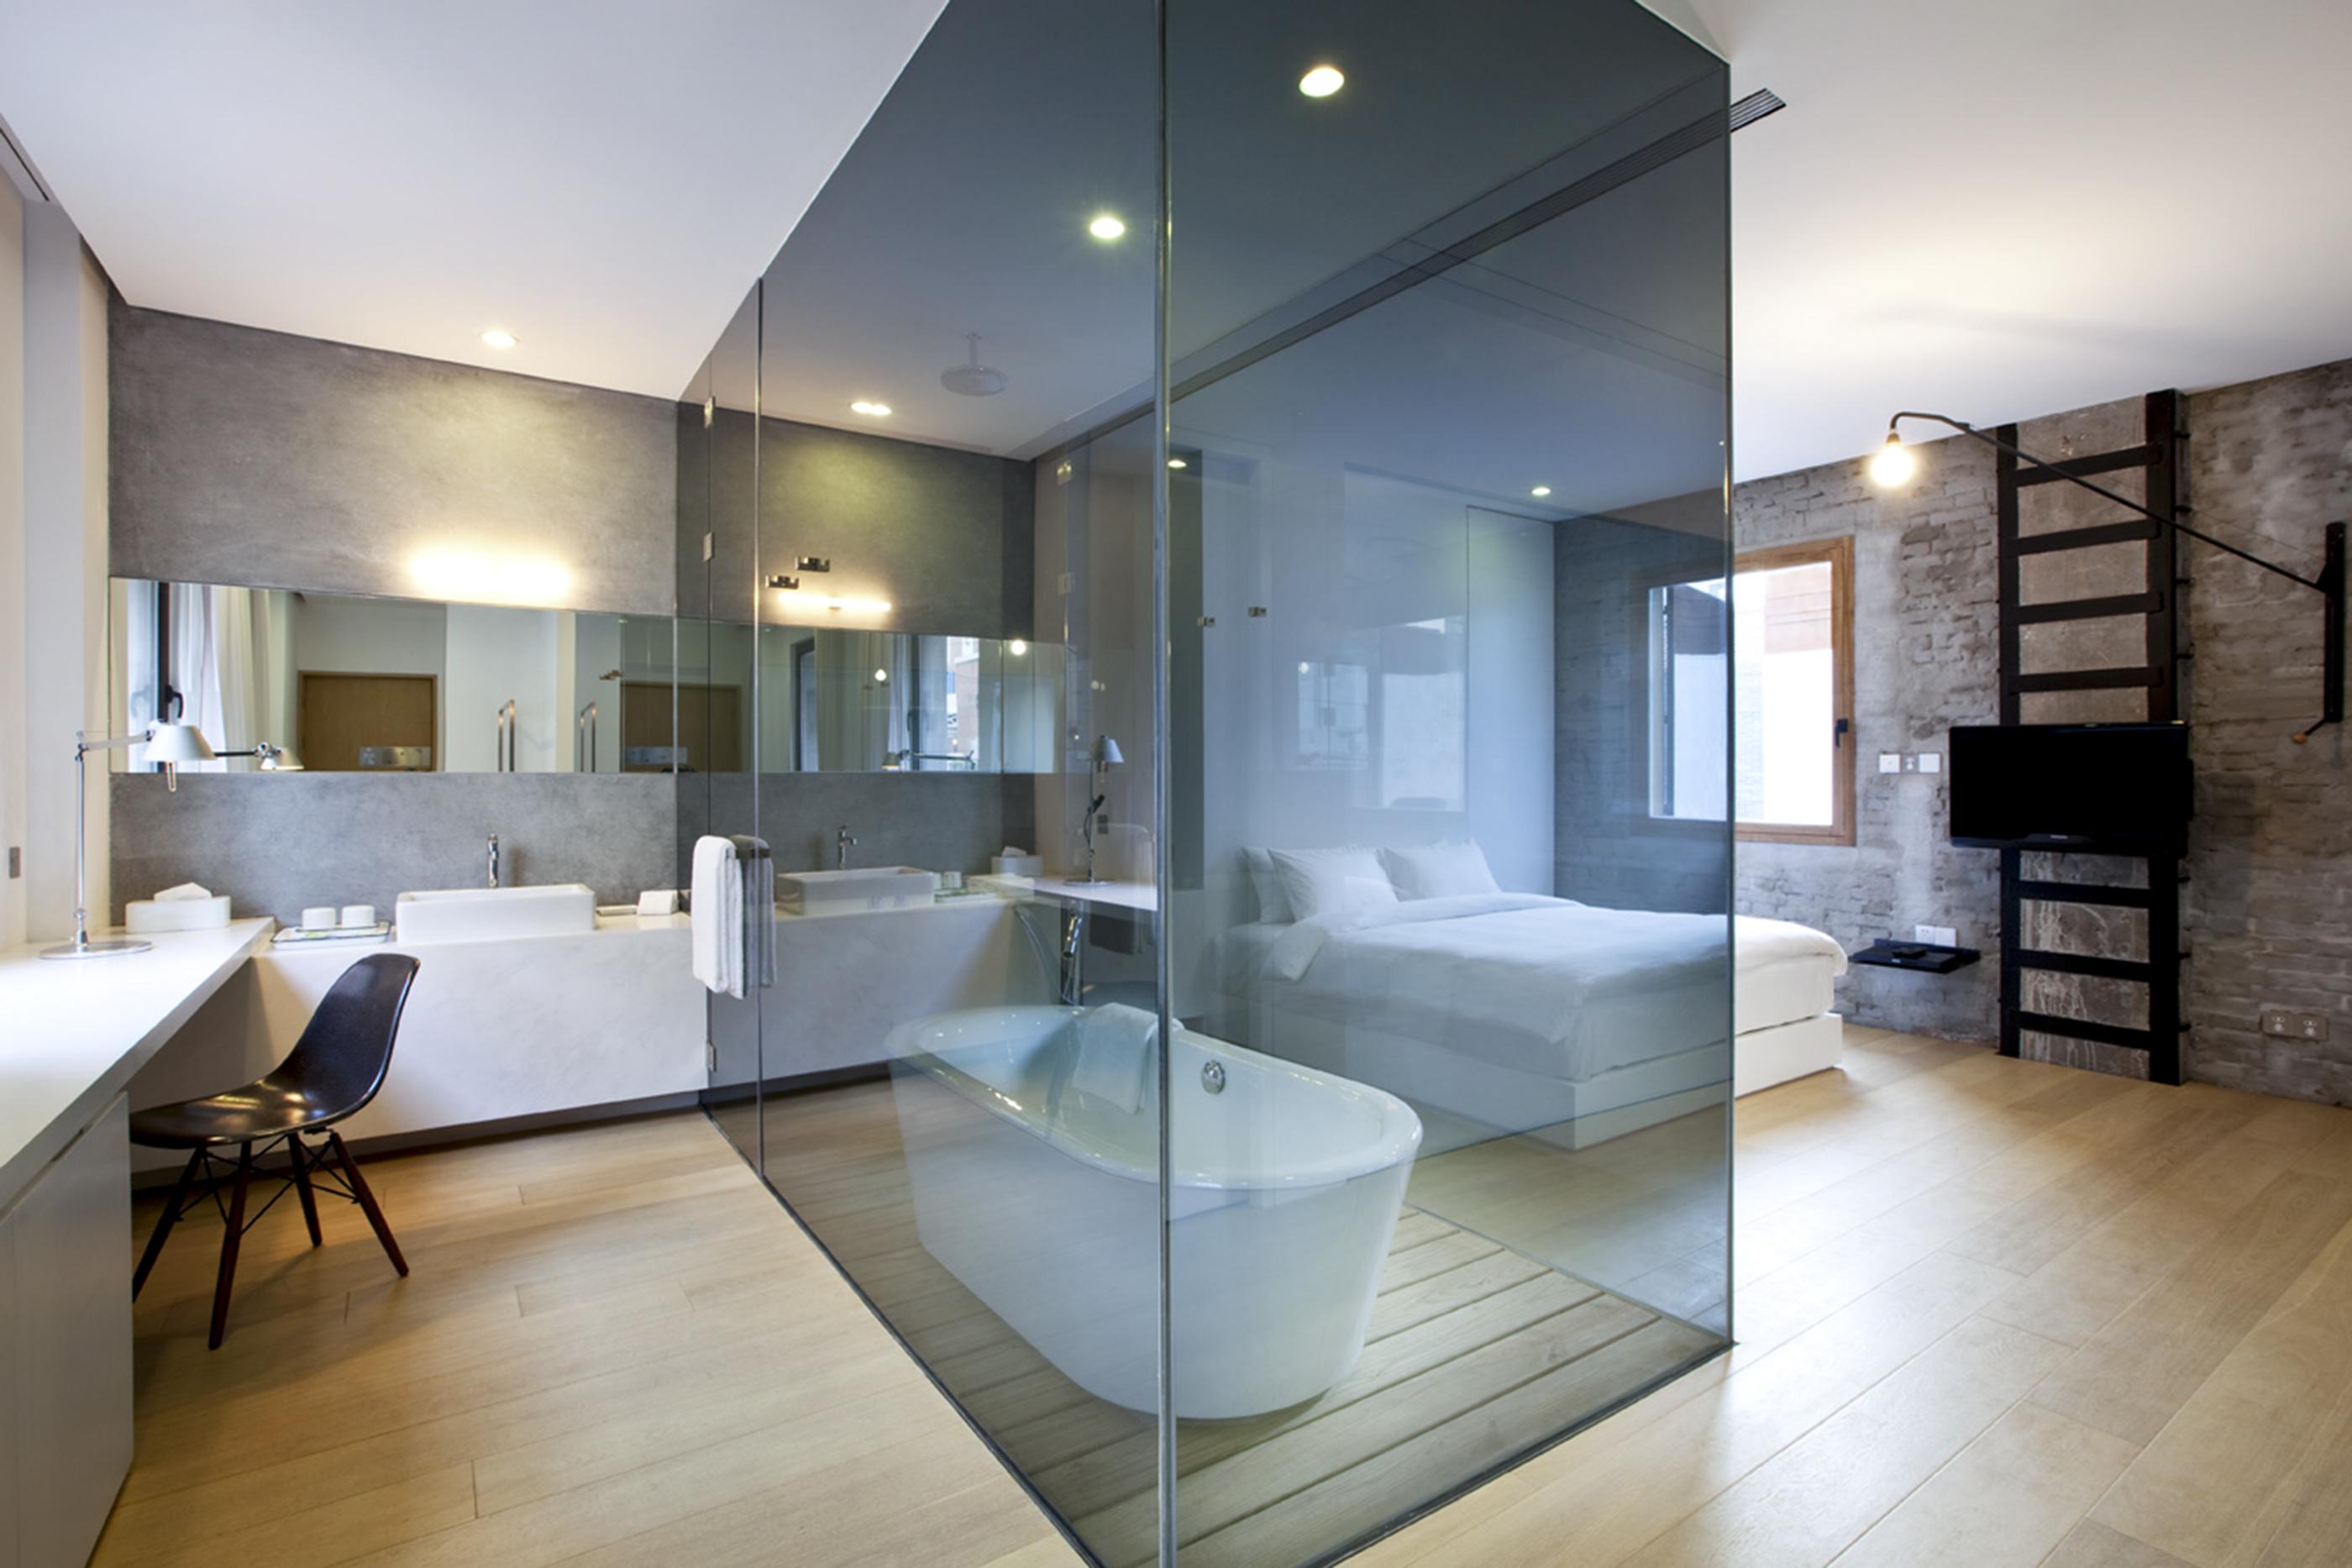 Spg design hotels travel weekly china for Design hotel spg